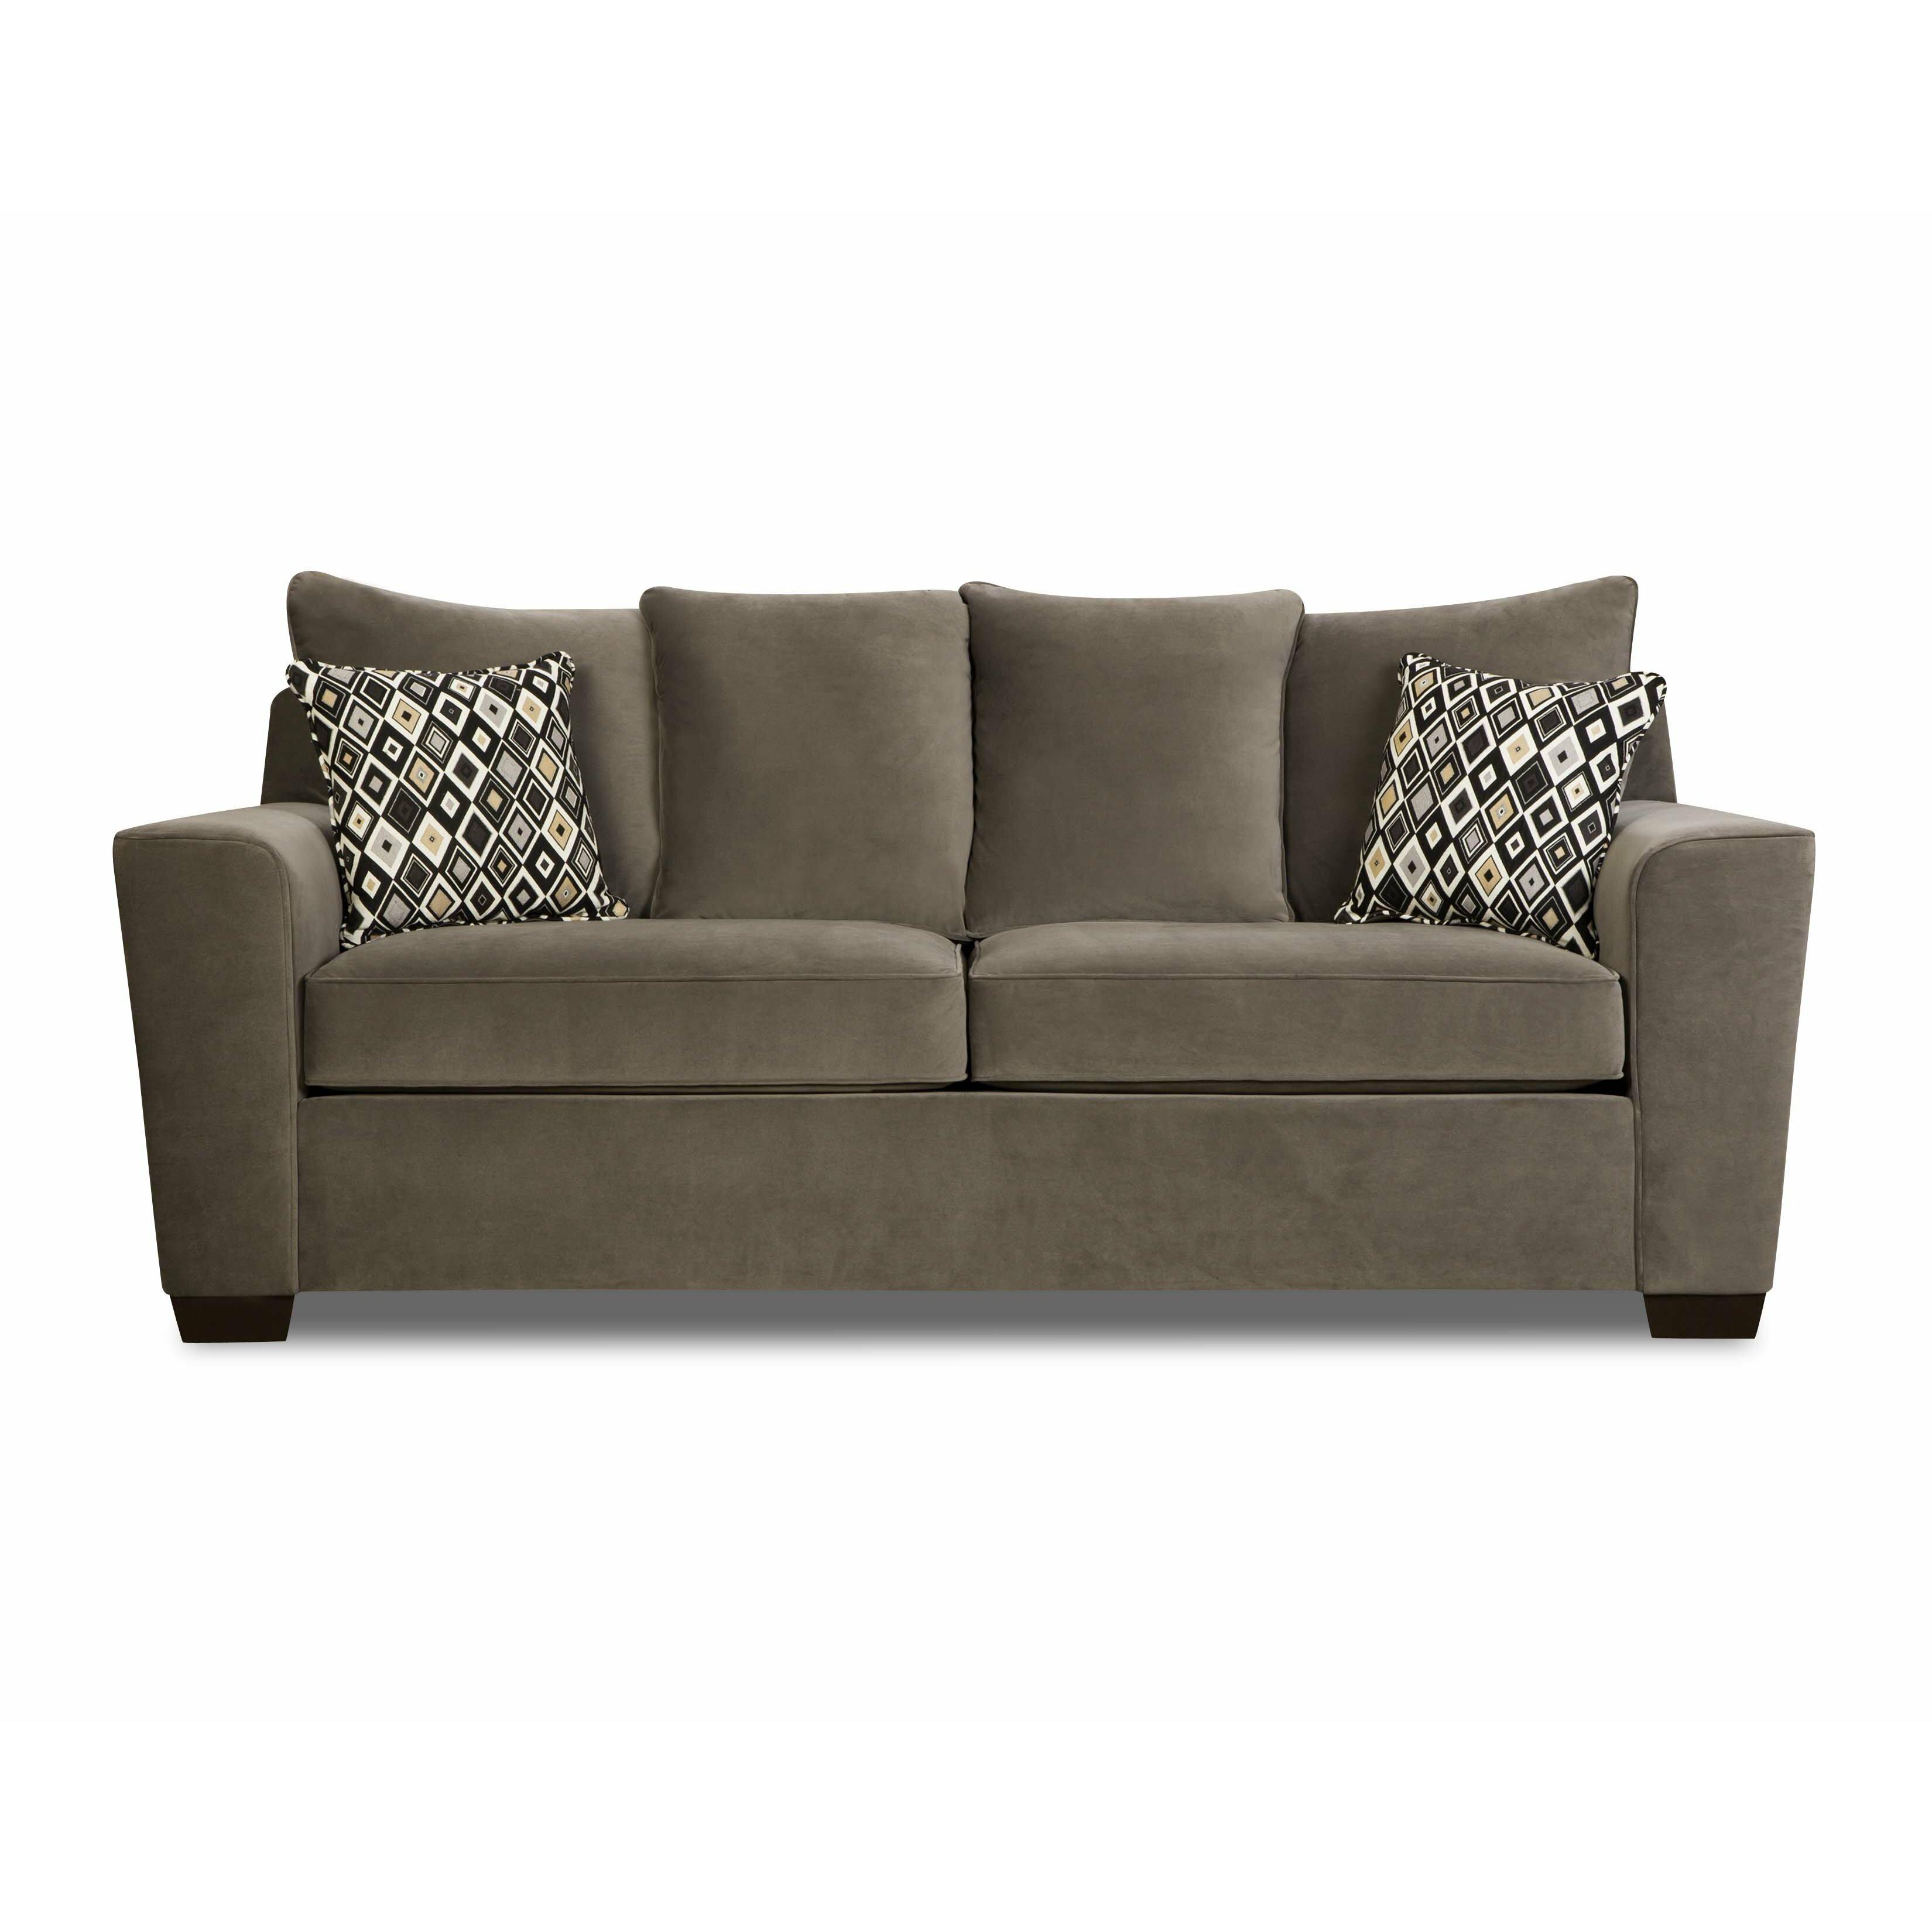 Simmons upholstery roxanne queen sleeper sofa reviews for Sleeper sofas